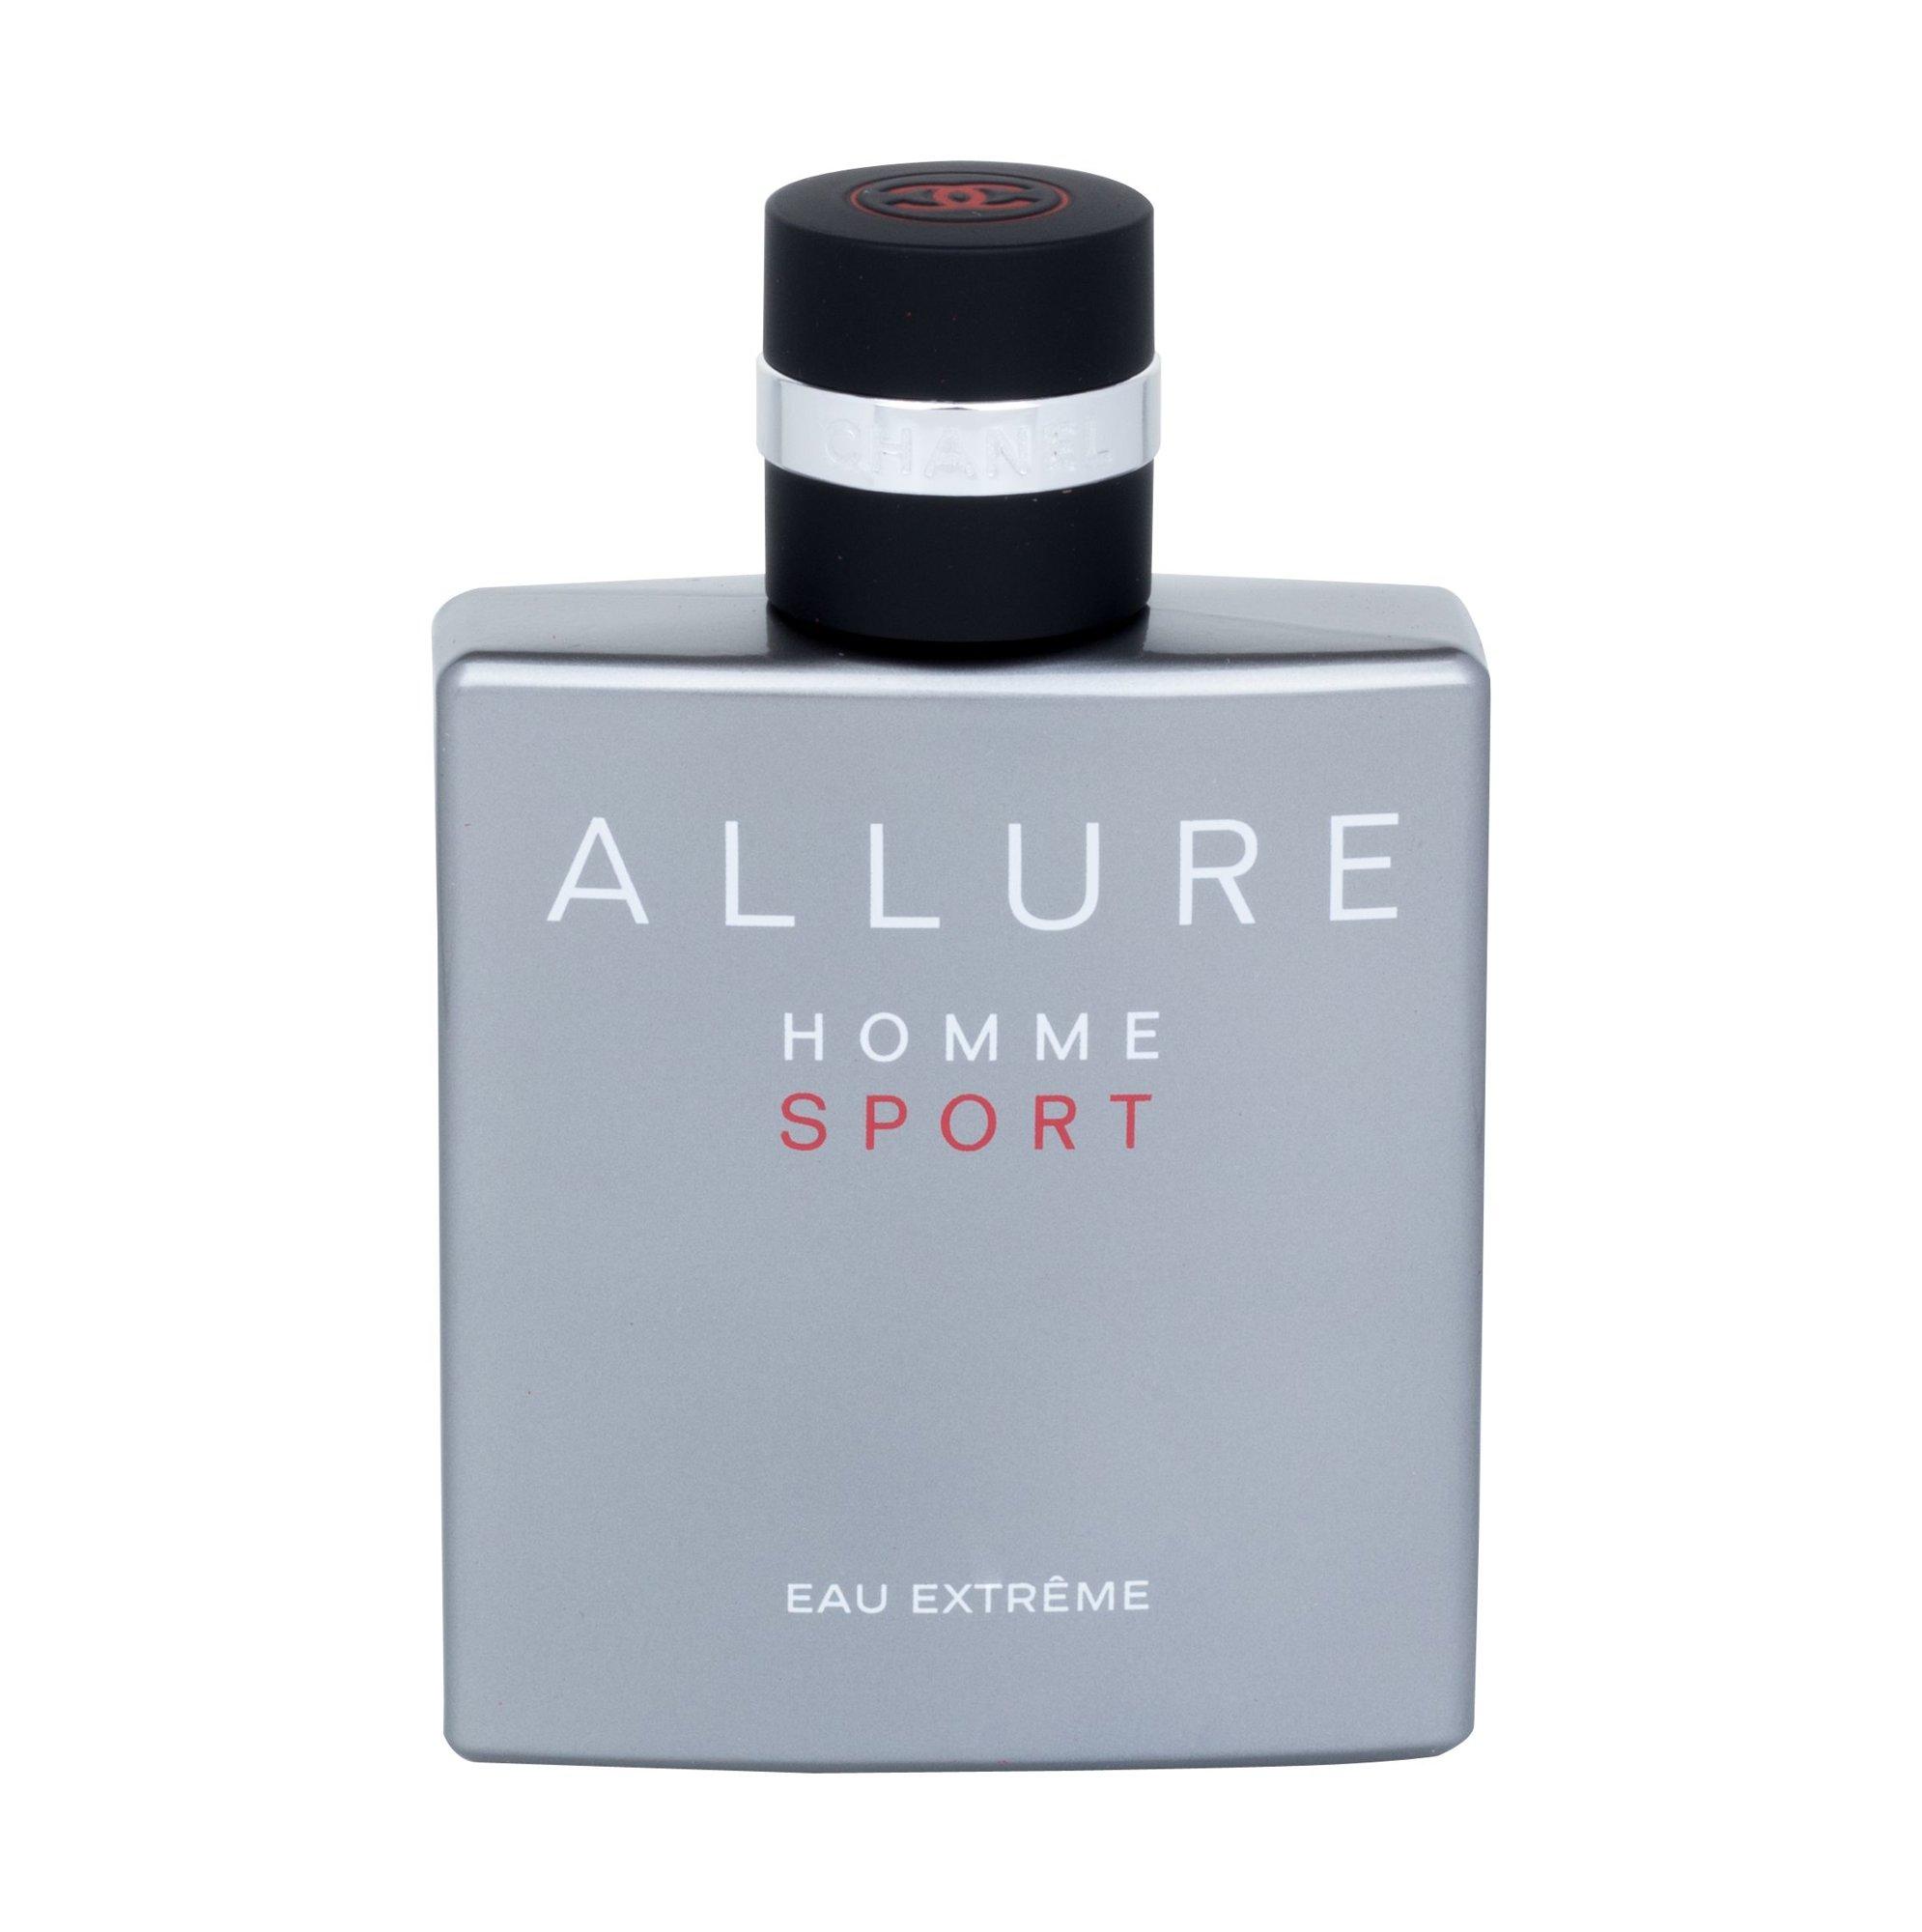 Chanel Allure Homme Sport Eau Extreme EDP 50ml